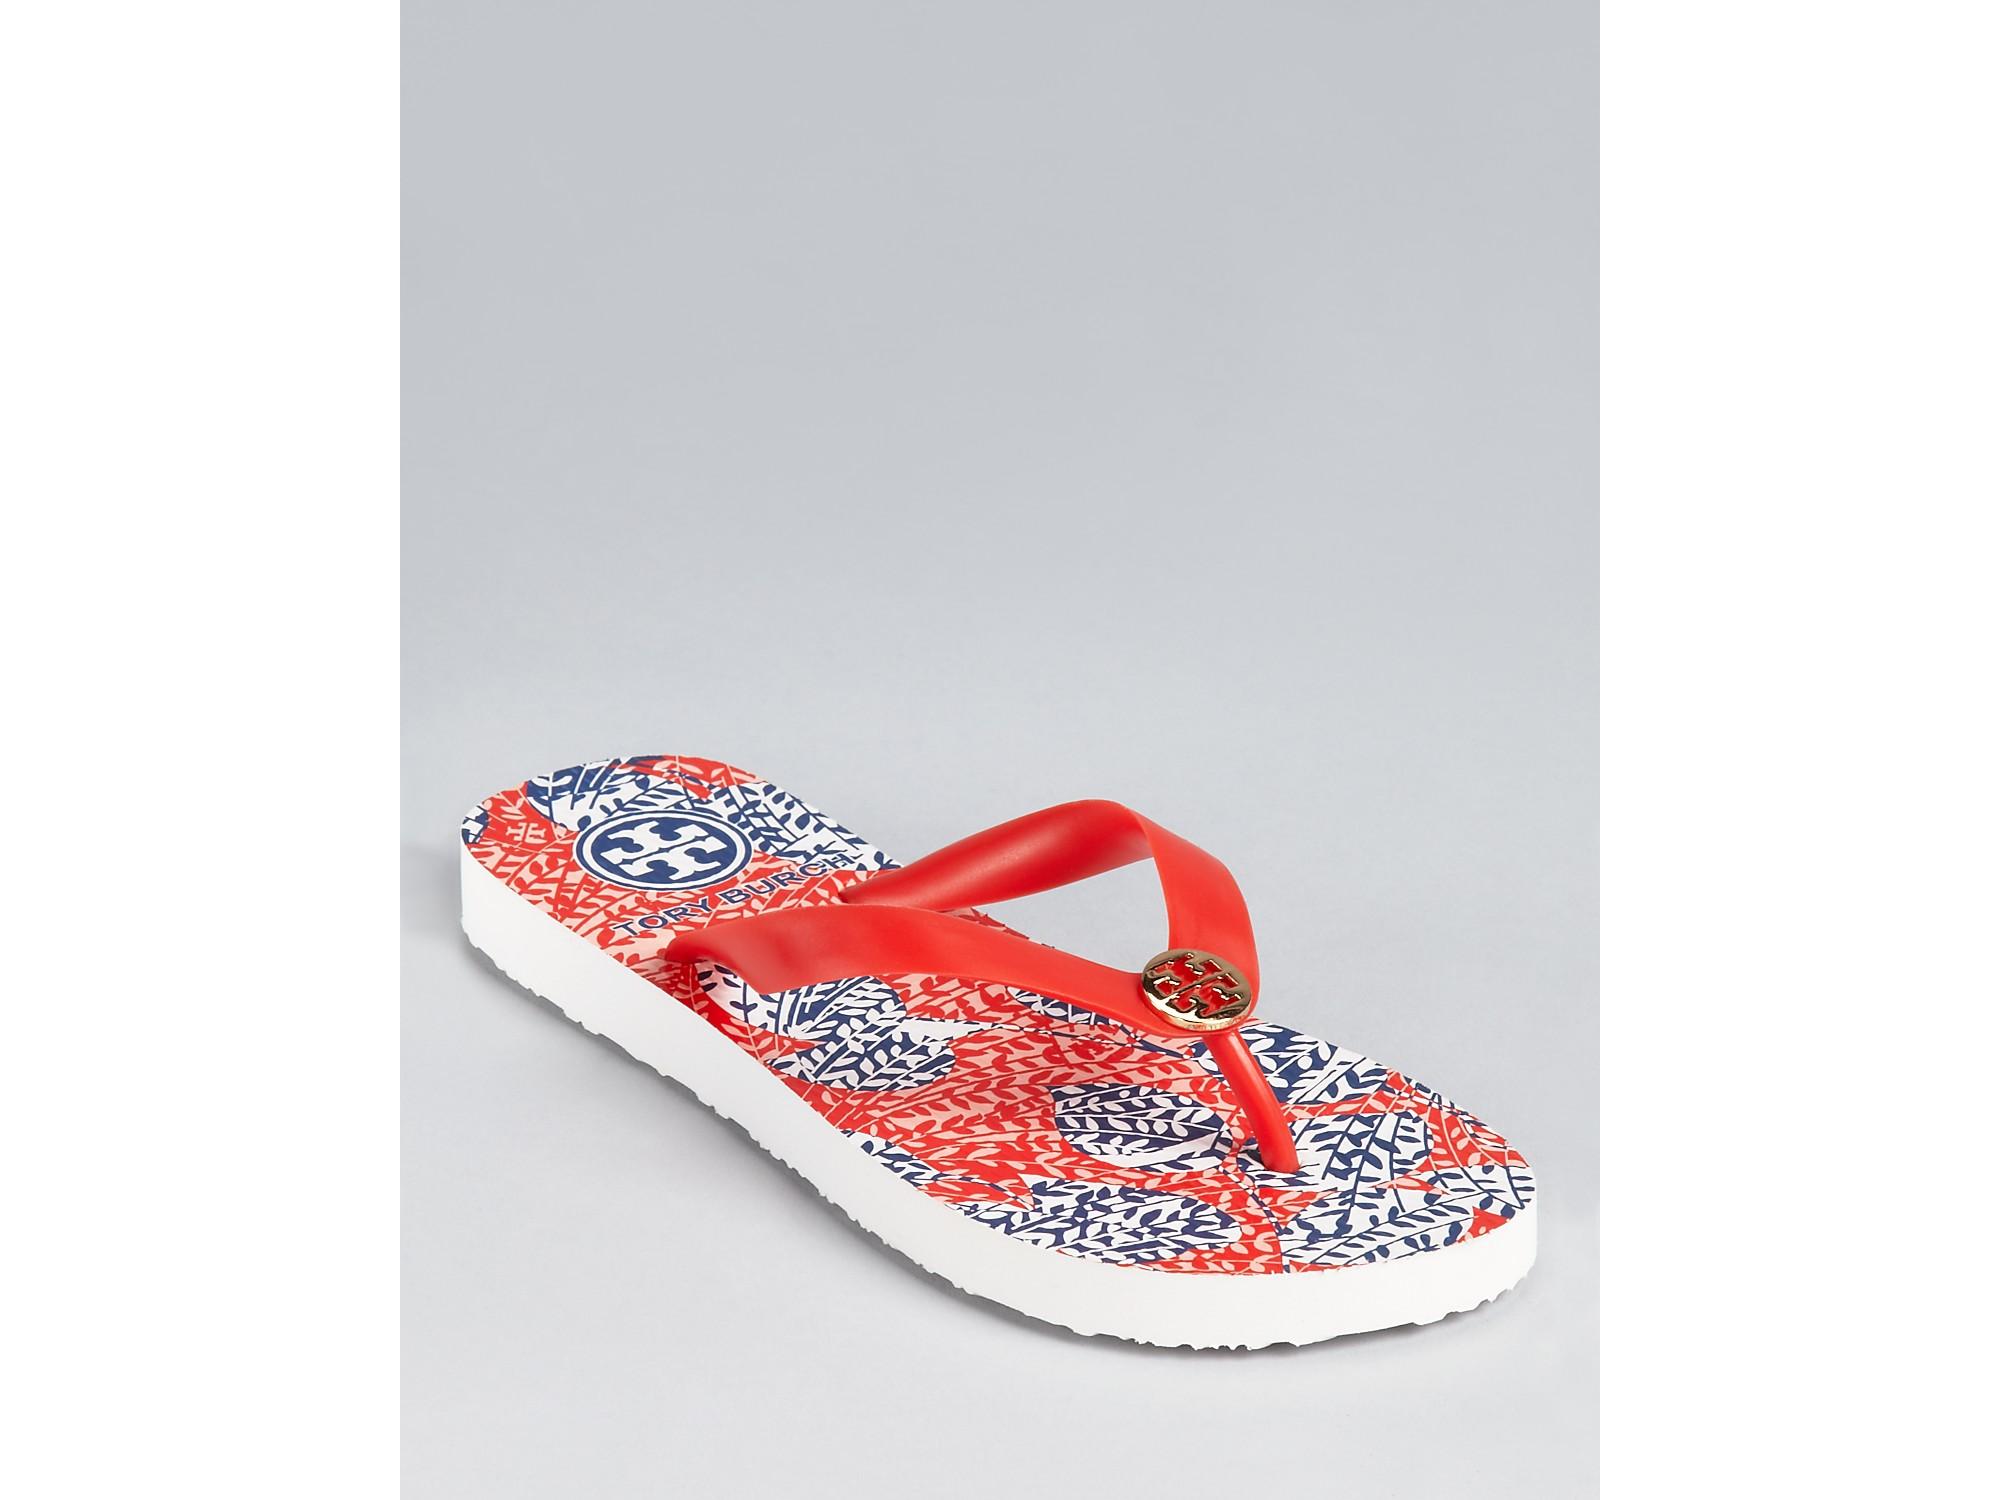 565599201 Lyst - Tory Burch Flip Flops in Red